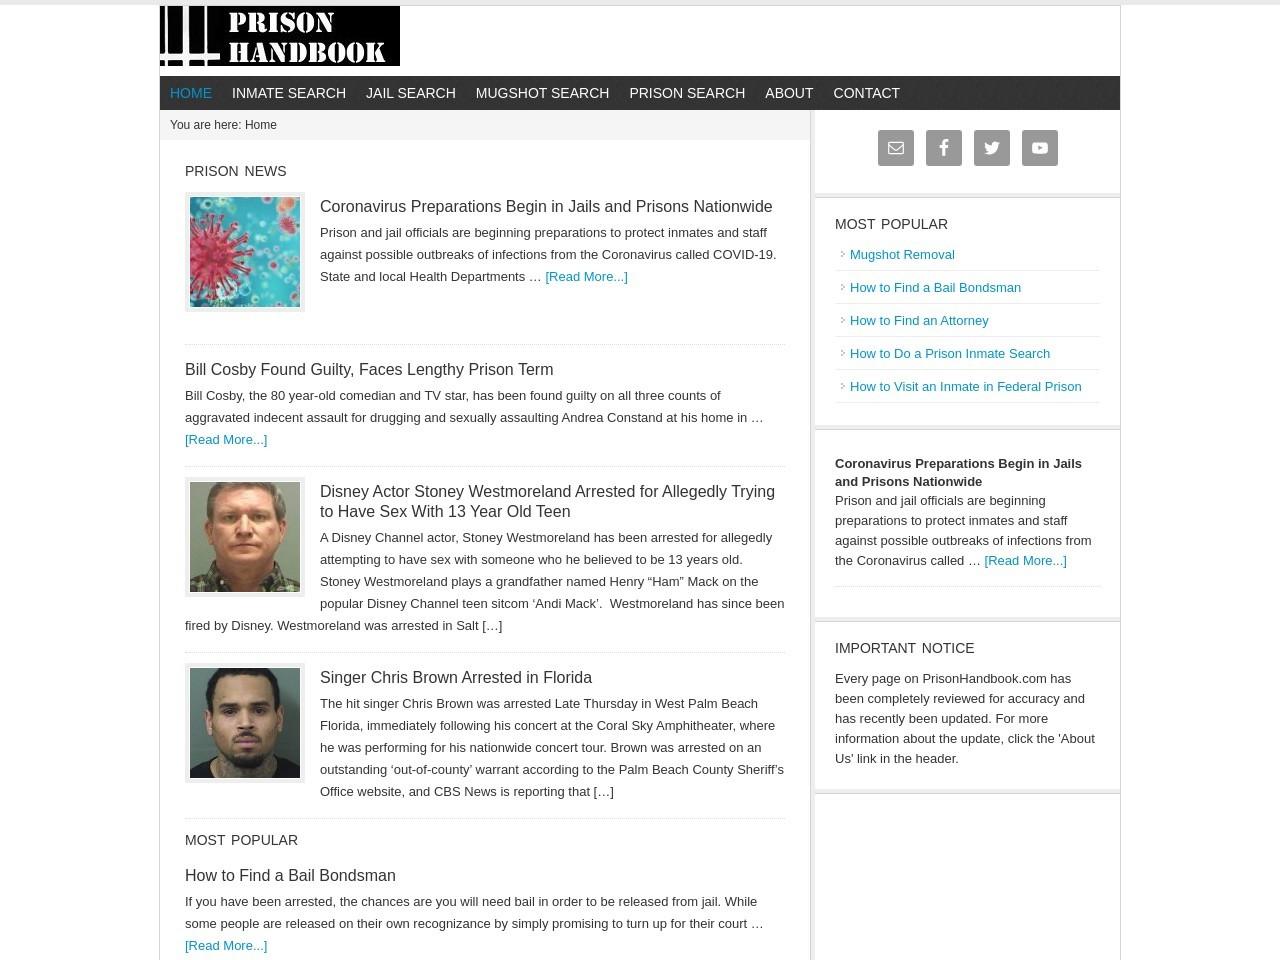 prisonhandbook.com